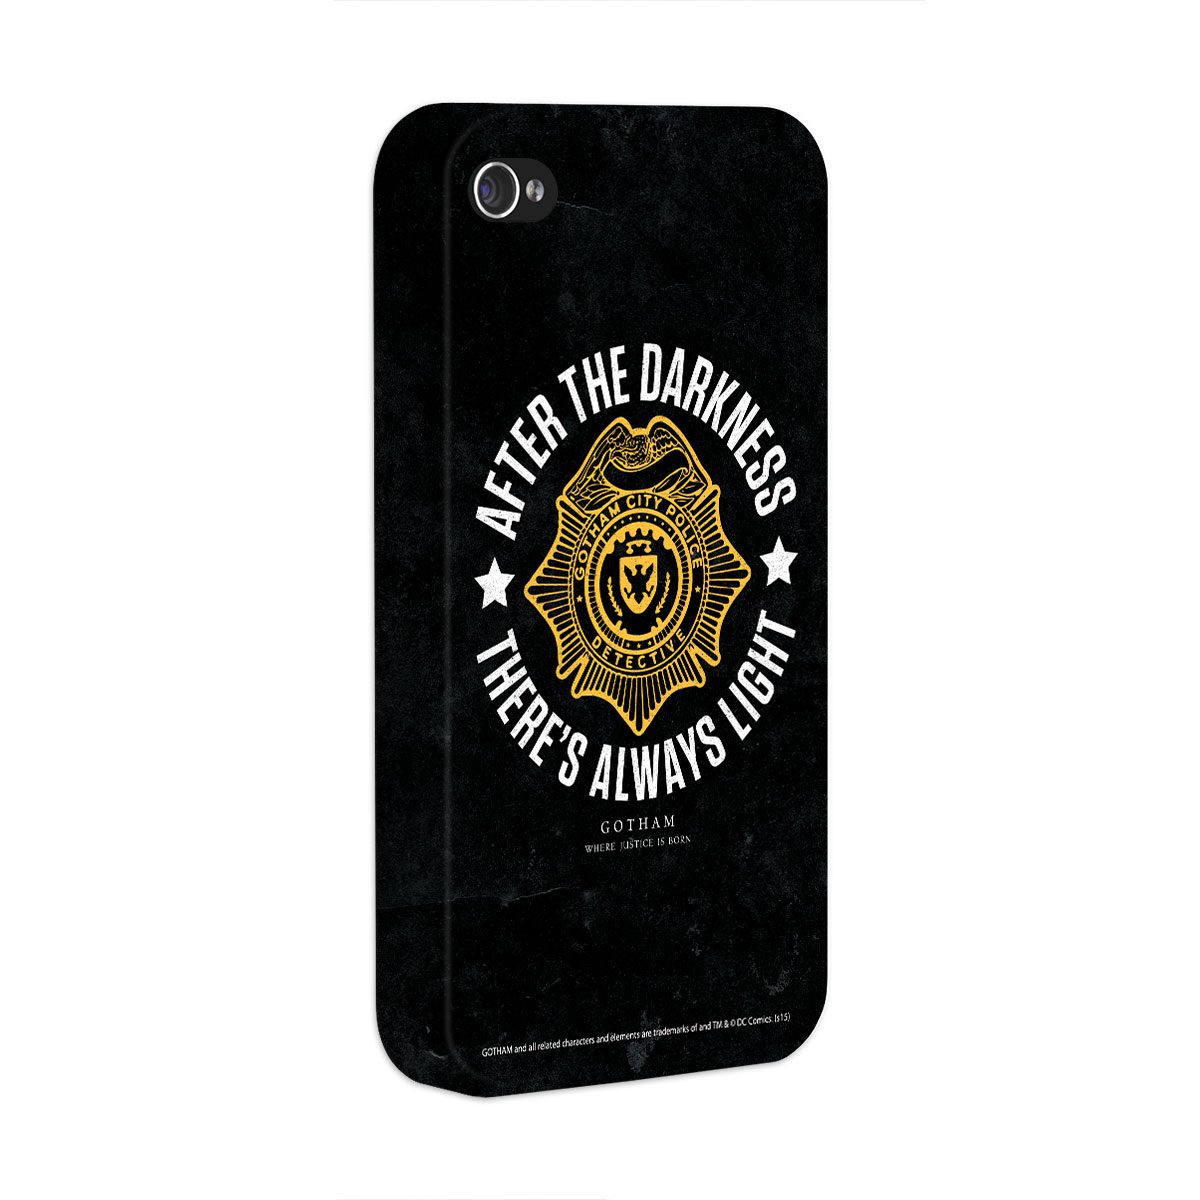 Capa para iPhone 4/4S Gotham There�s Always Light